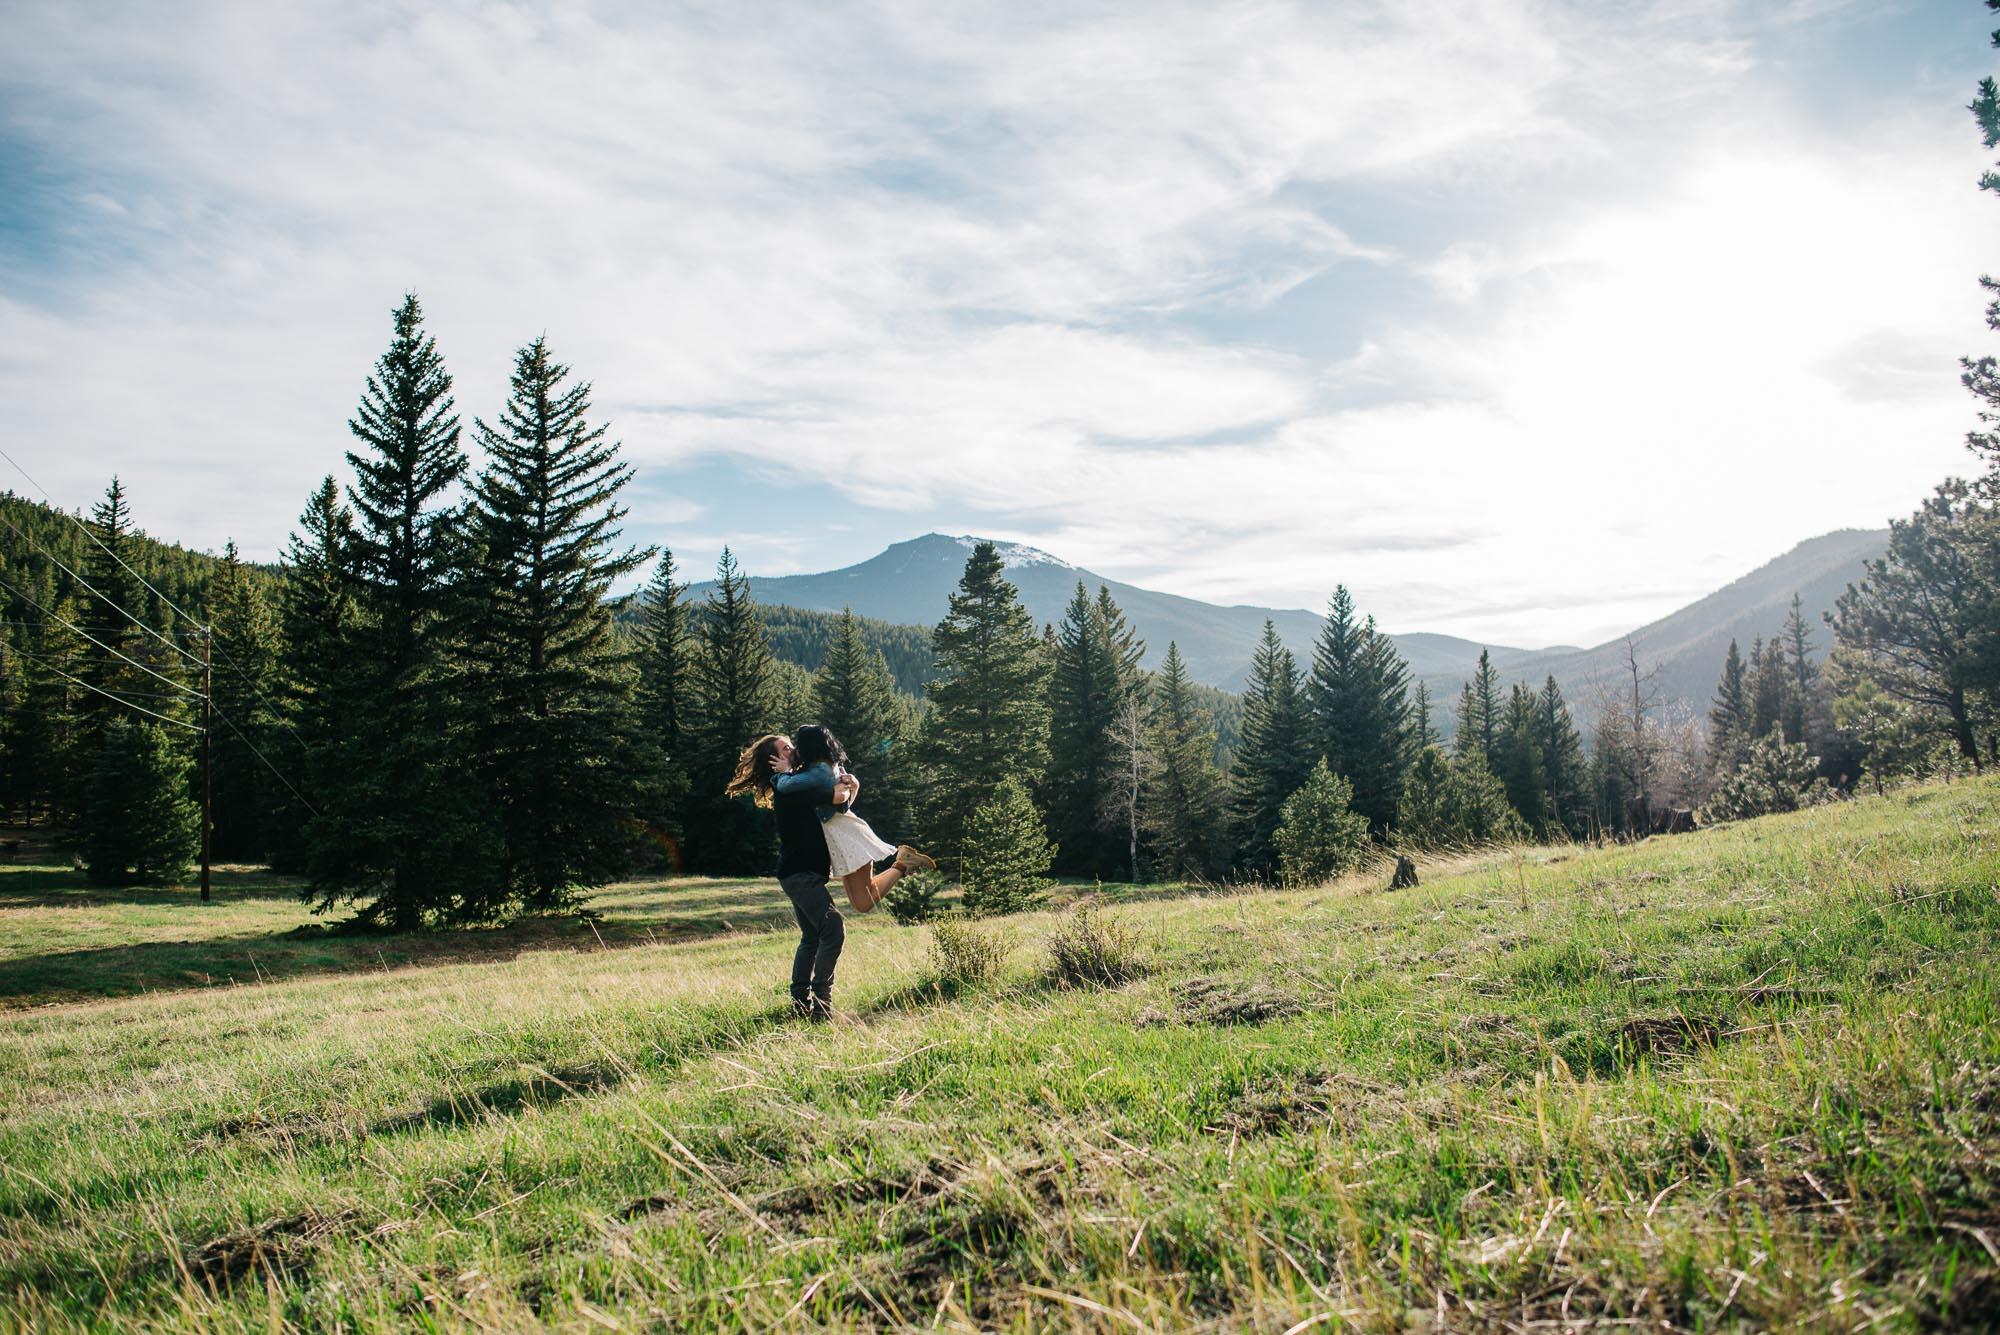 16-14couple-anniversary-engagement-photographer-colorado-romantic-photos-mountain-wedding-photographer-trevr&marissa-2016-2358.jpg